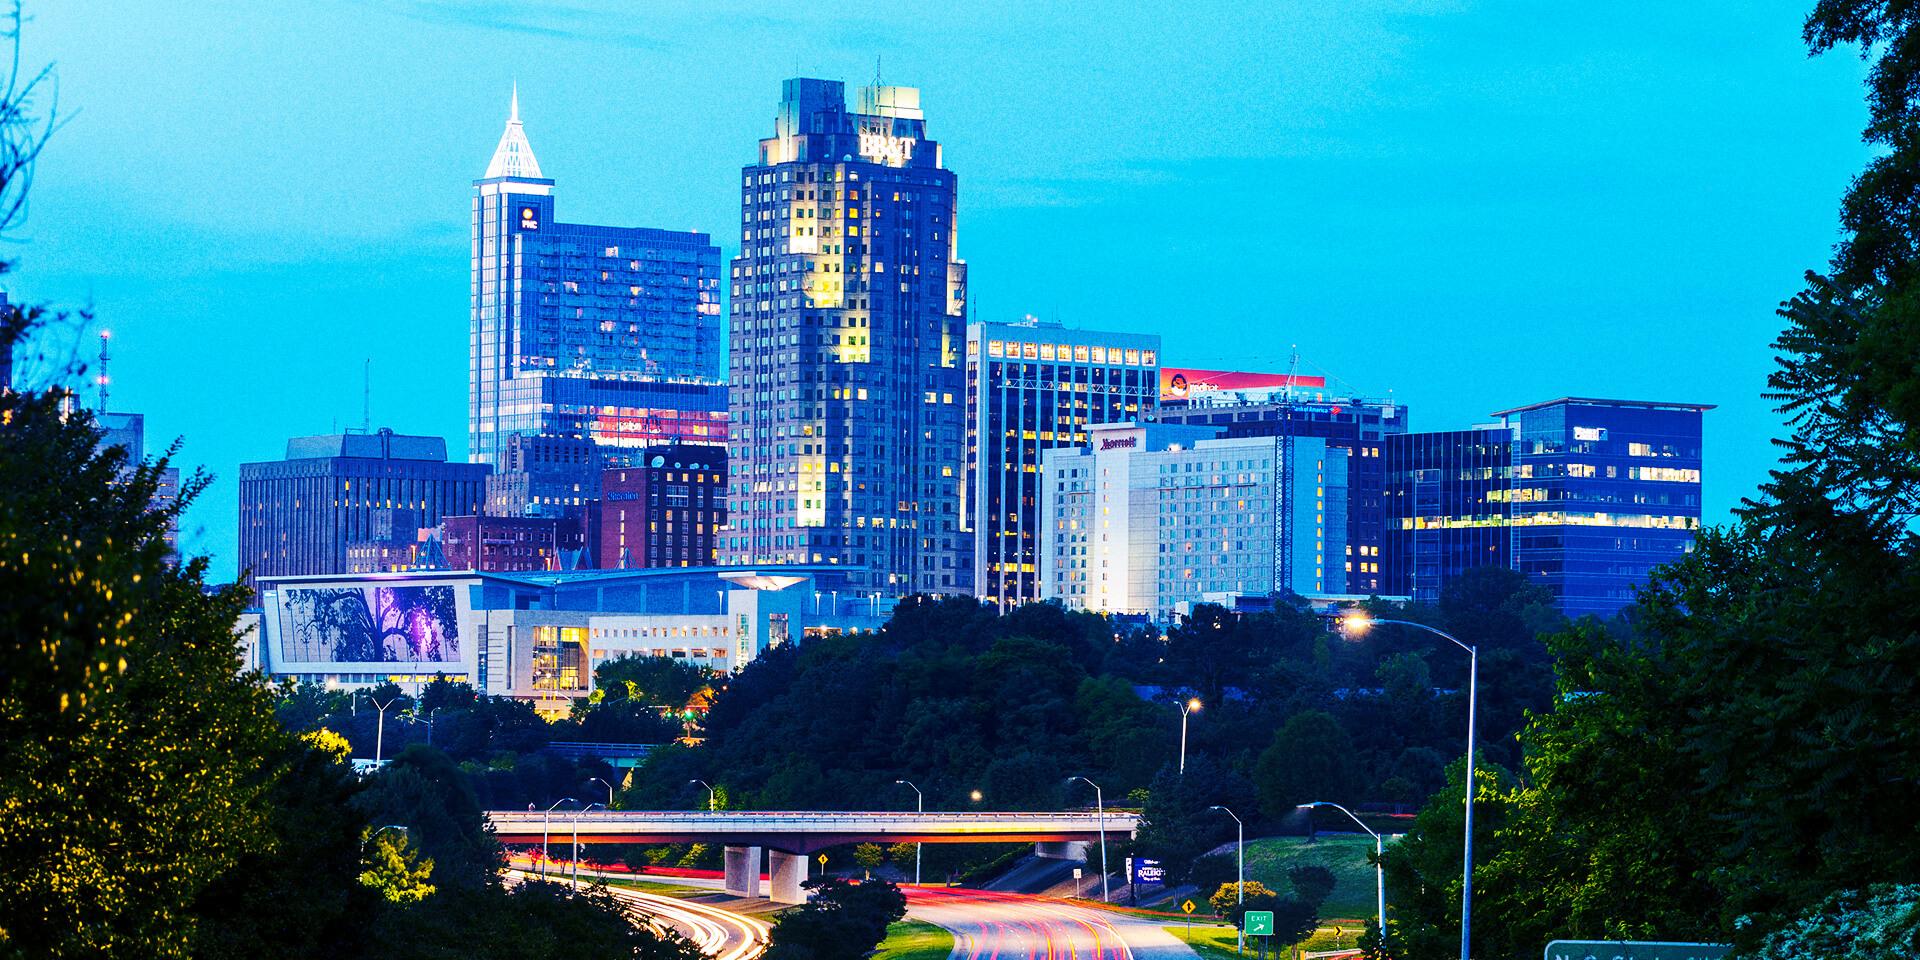 Unreal Academy Enterprise, Raleigh 2019: Unlock the power of